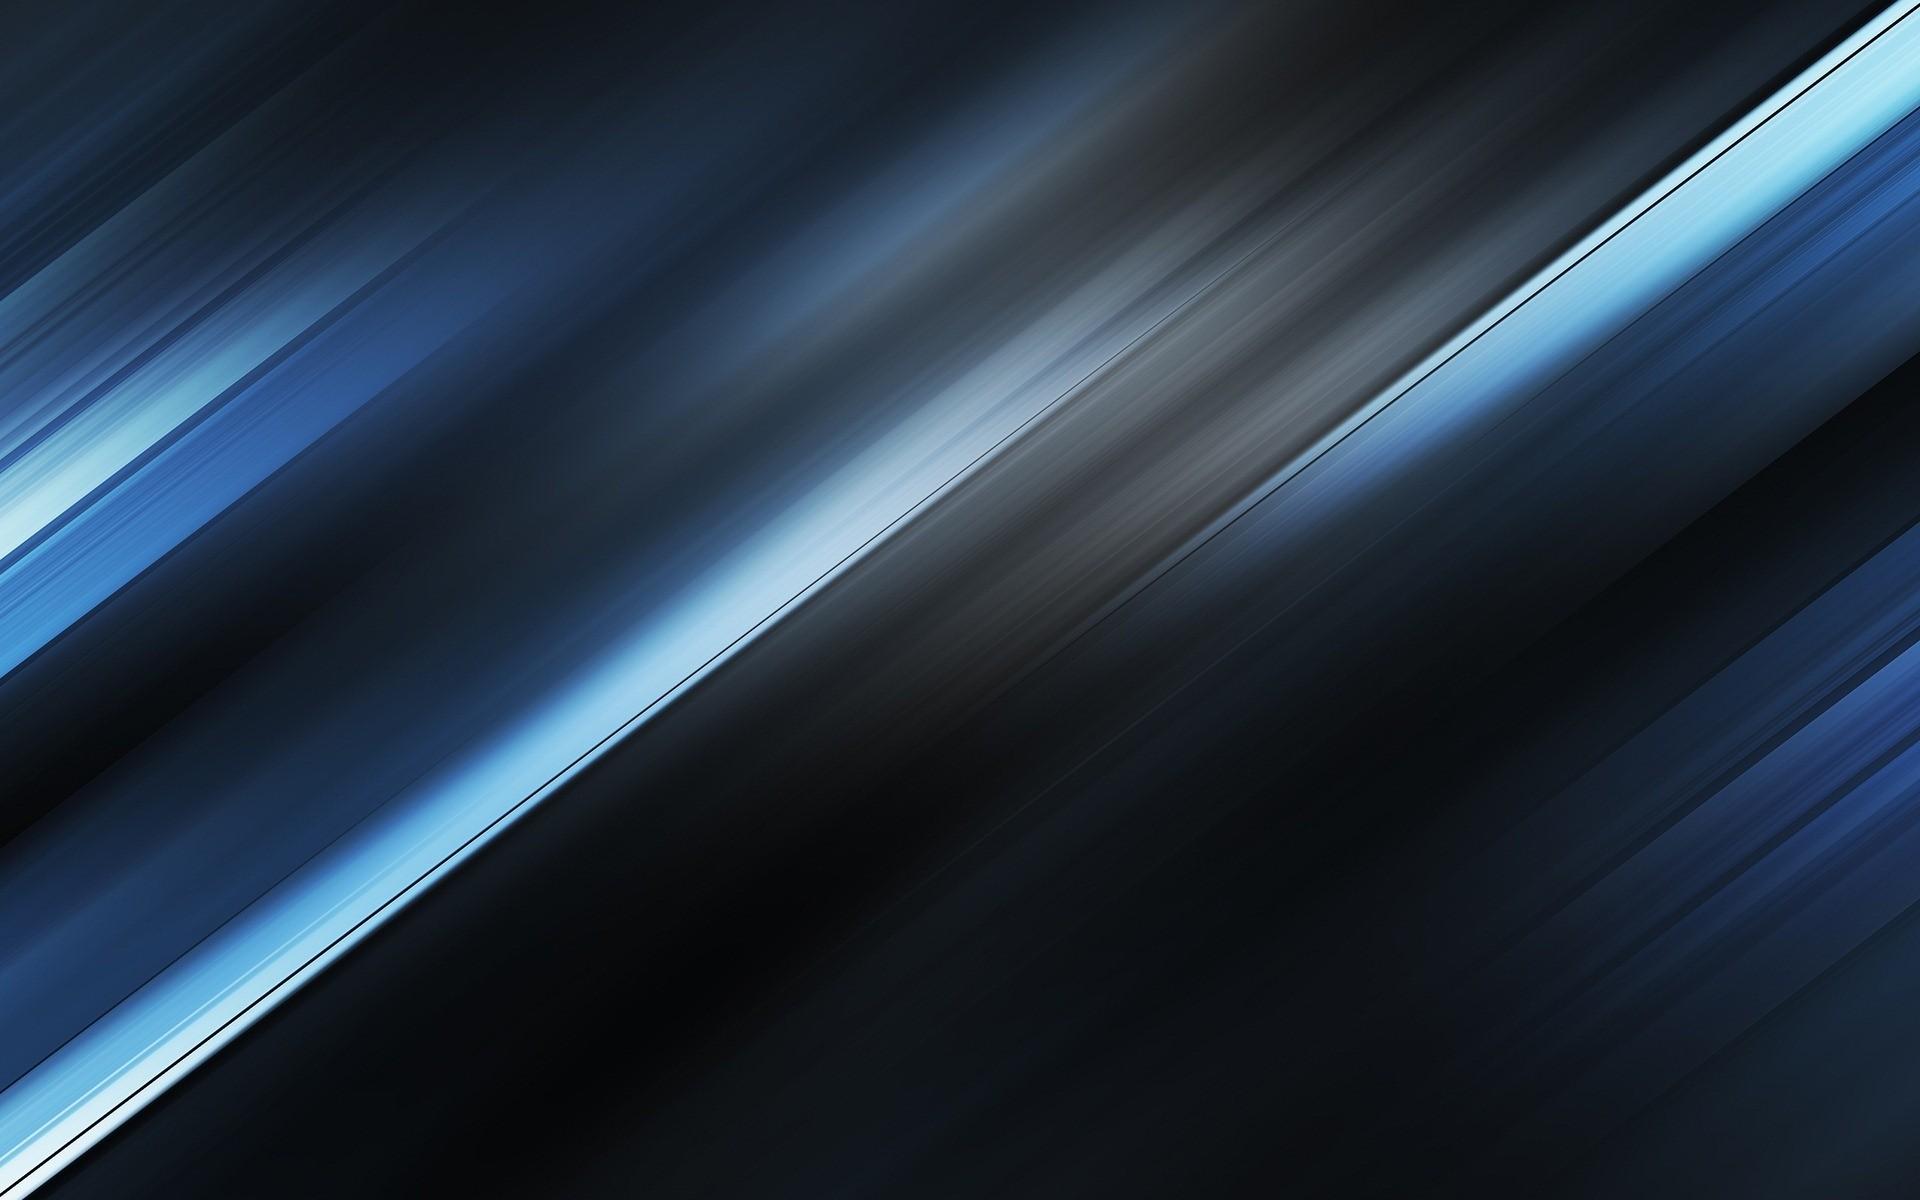 Abstract · Abstract Wallpaper